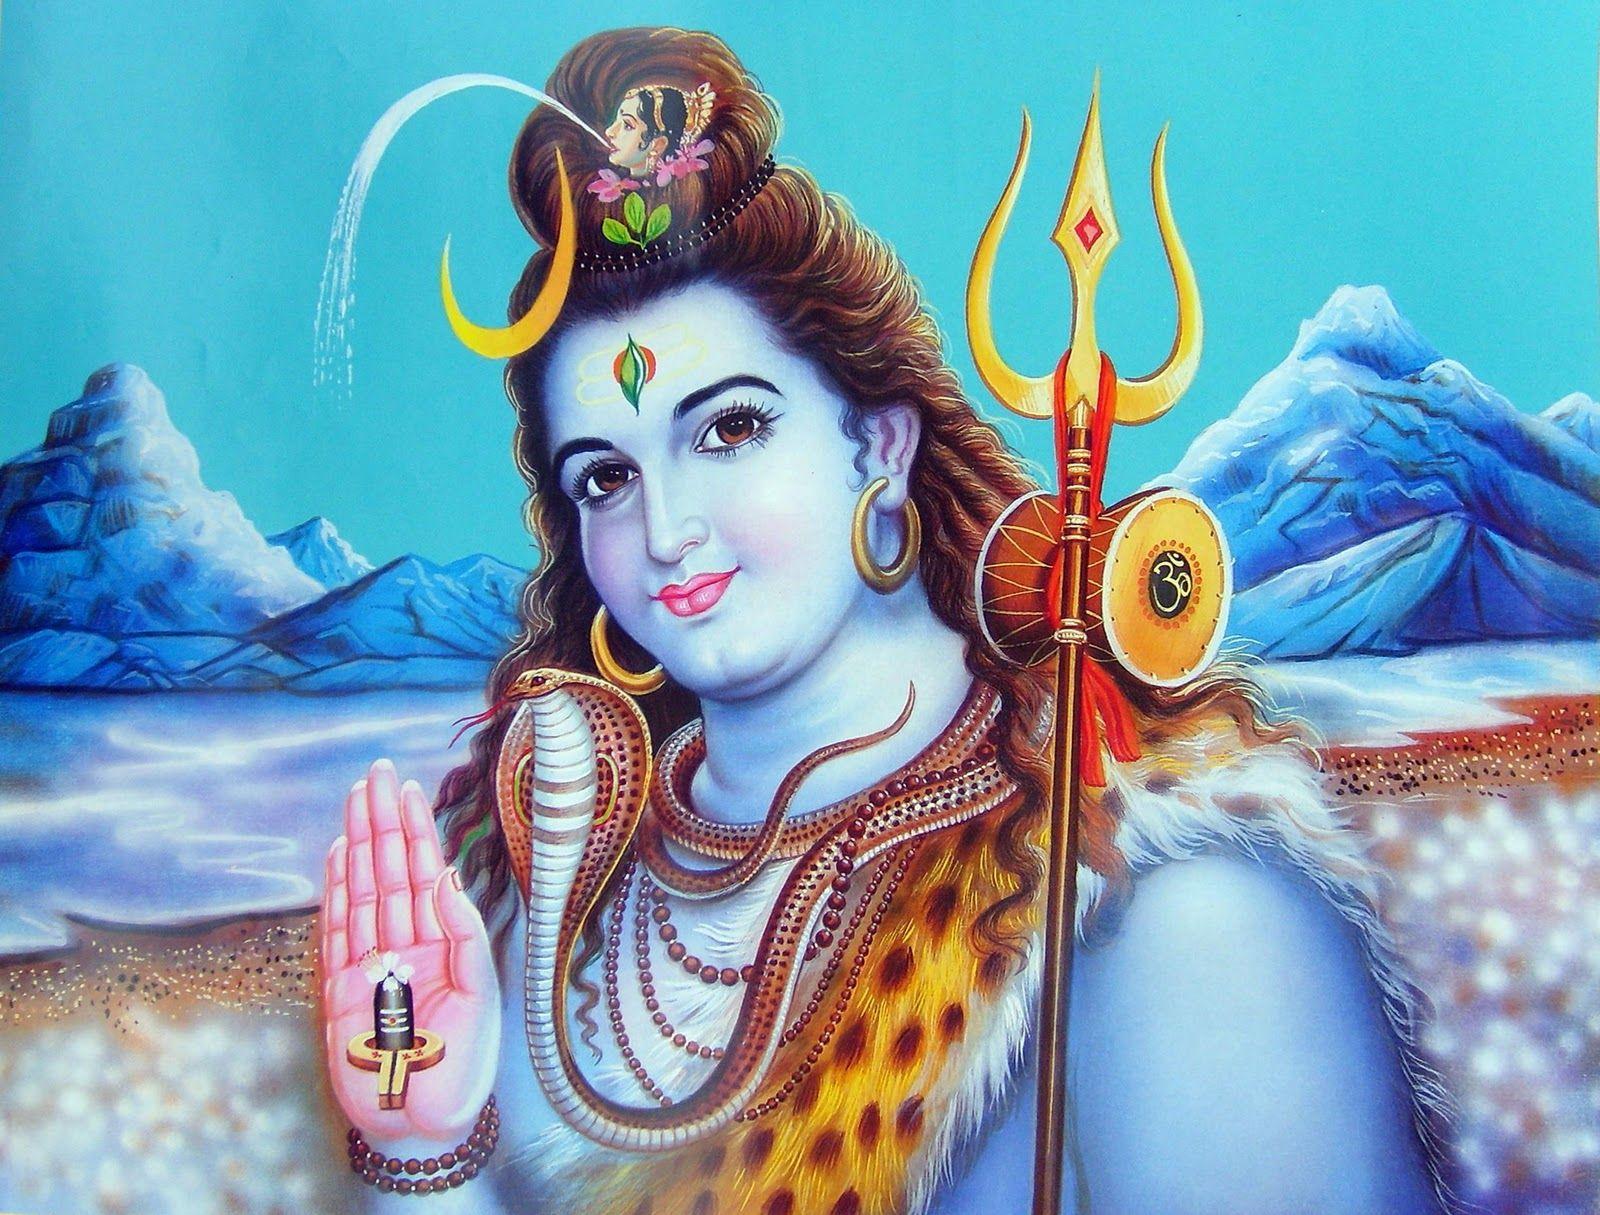 Wallpaper download bhakti - Bhole Nath Wallpaper Download Free Spiritual Hd Wallpapers In 2880x1800 2560x1600 1920x1200 And